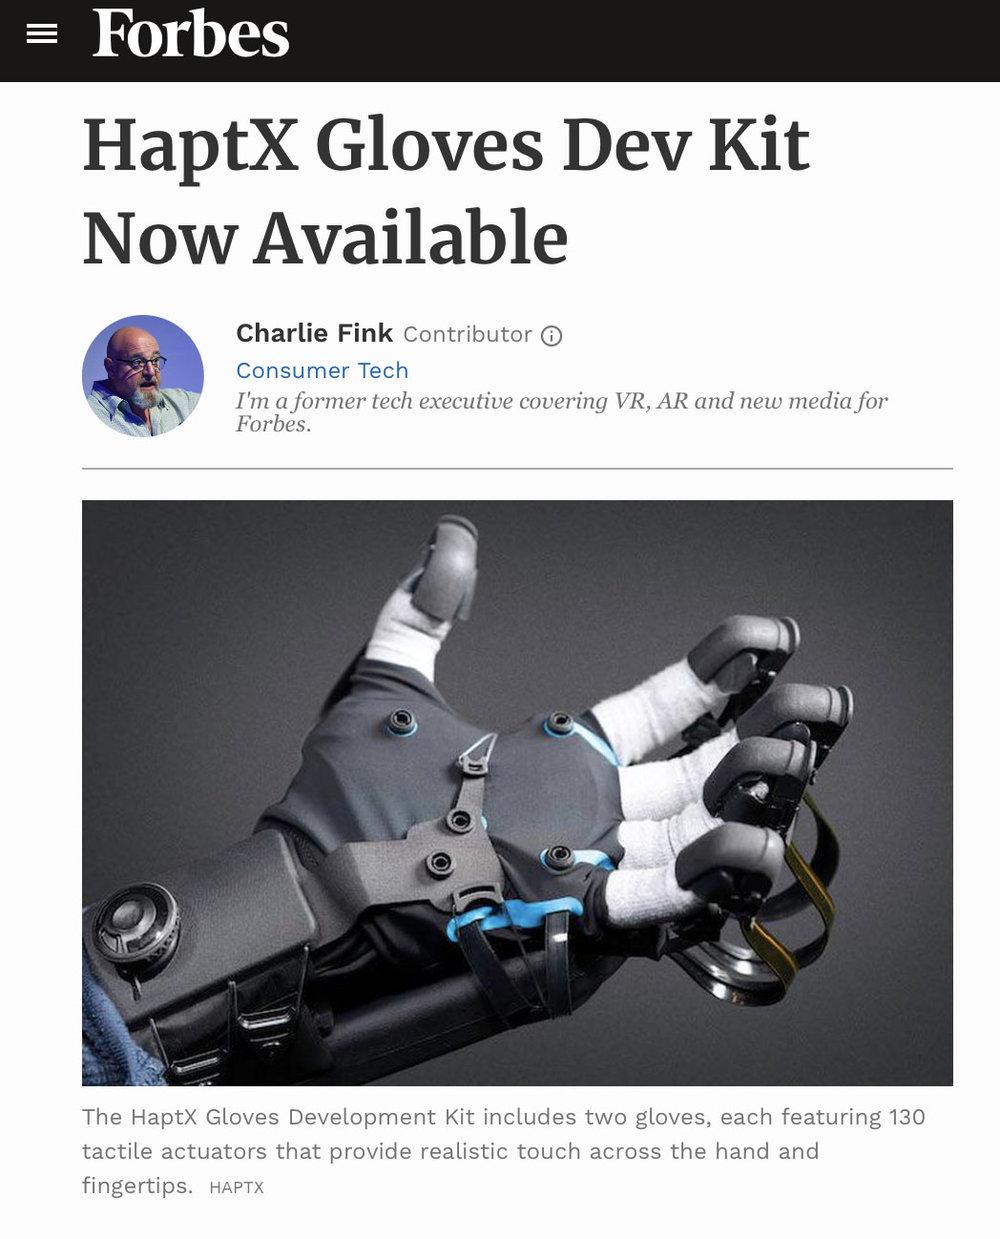 Forbes - HaptX